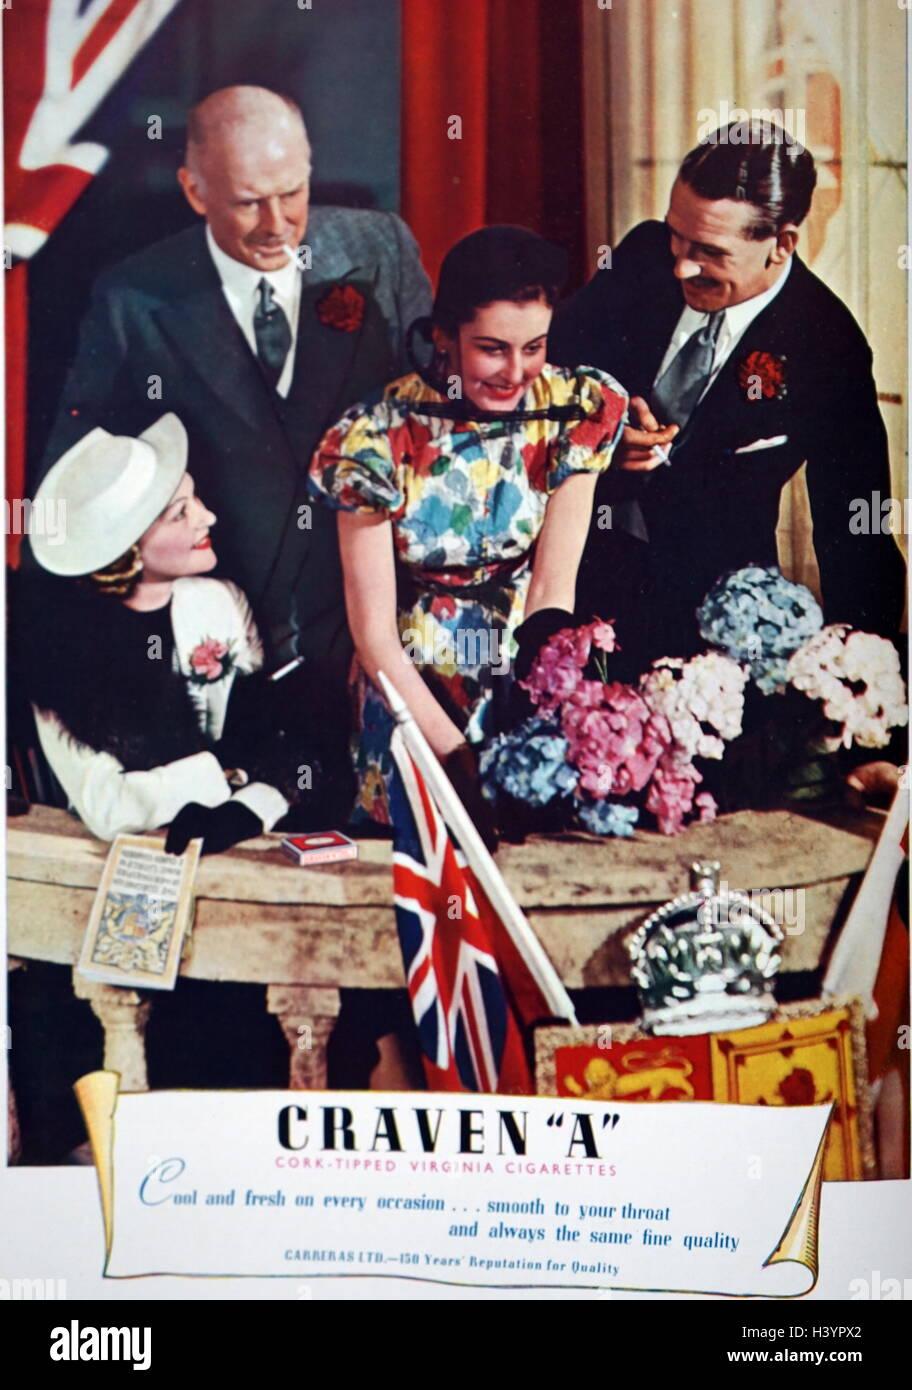 British Magazine Advert for Craven cigarettes 1953 - Stock Image